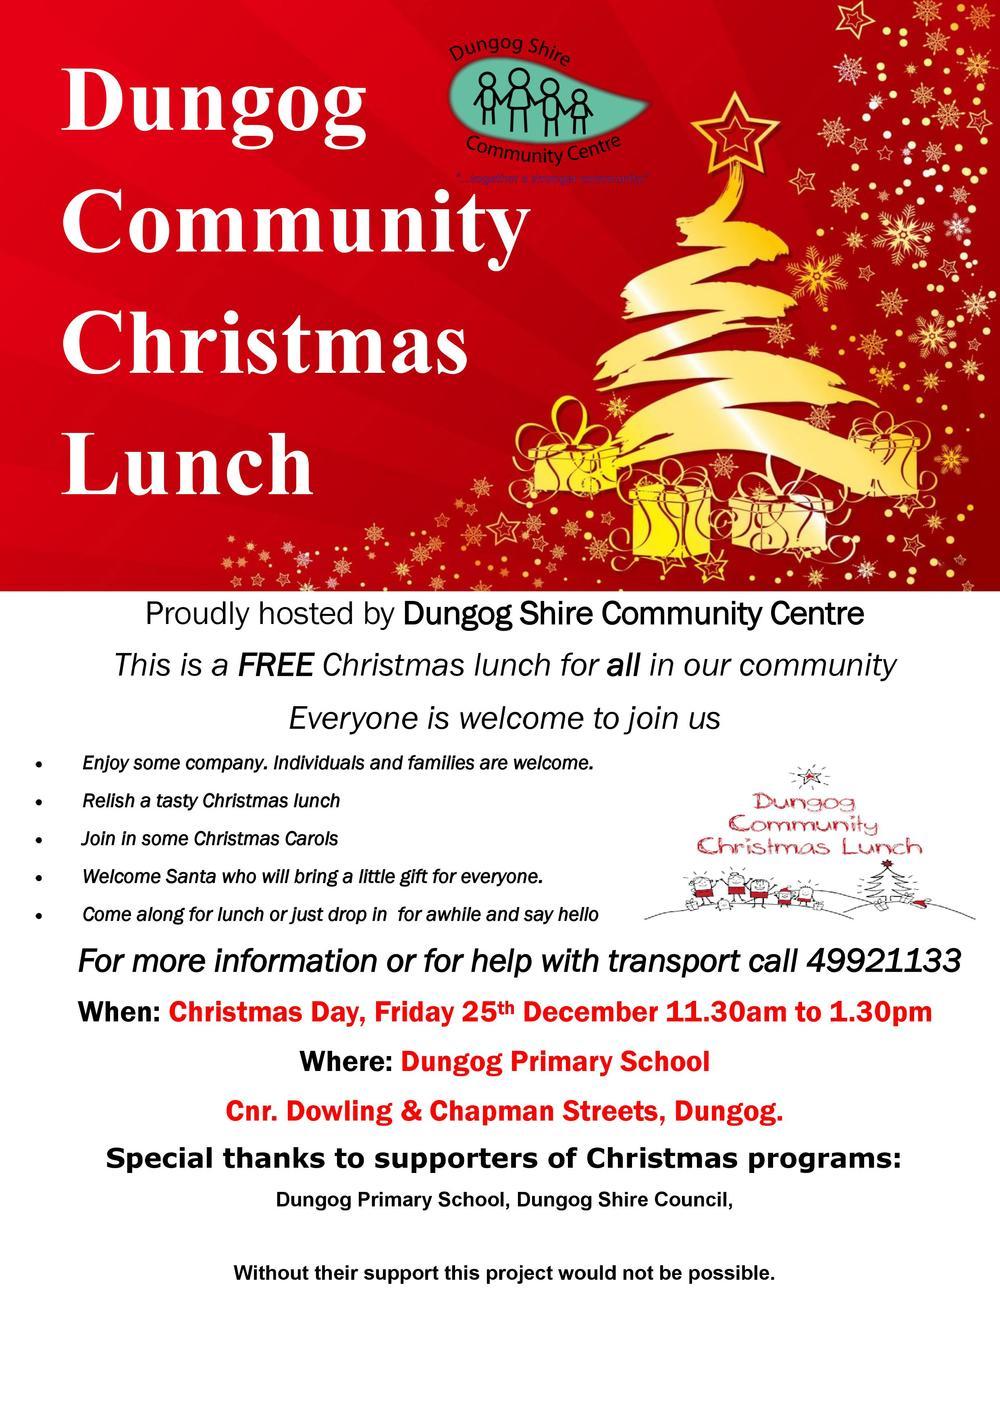 DSCC Community Christmas Lunch.jpg